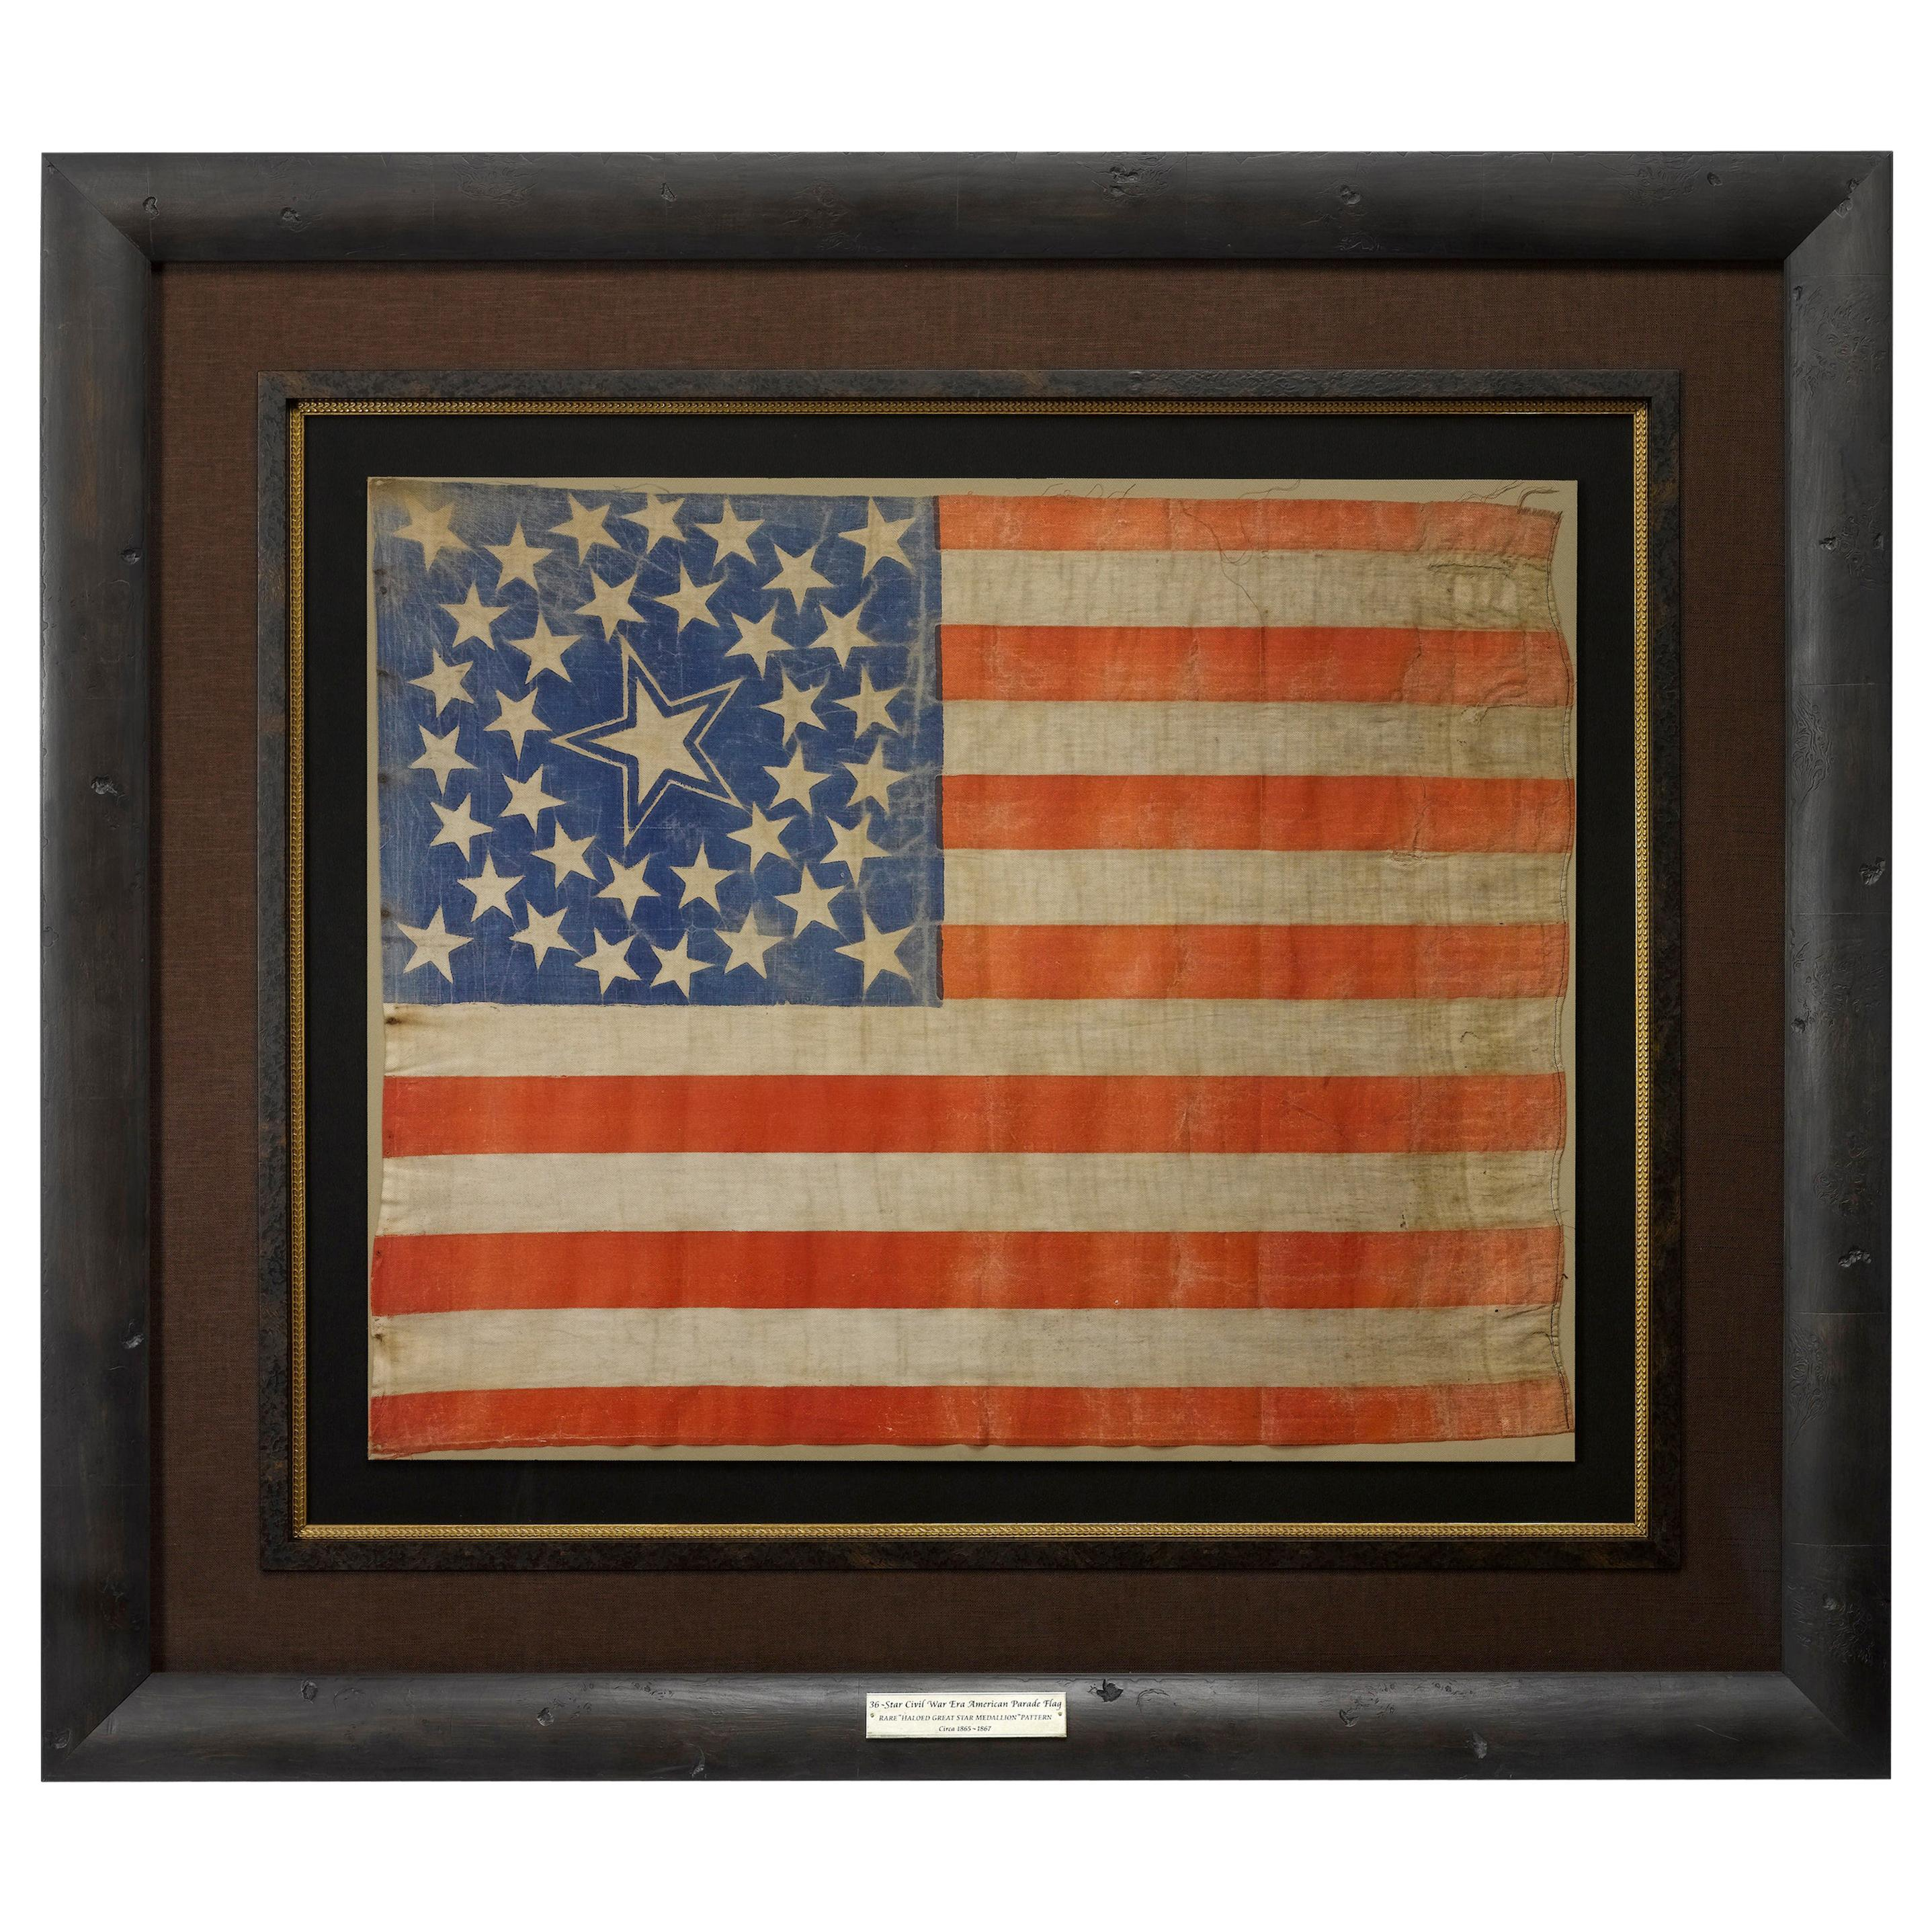 36-Star Antique American Flag with Rare Haloed Star Medallion, circa 1865